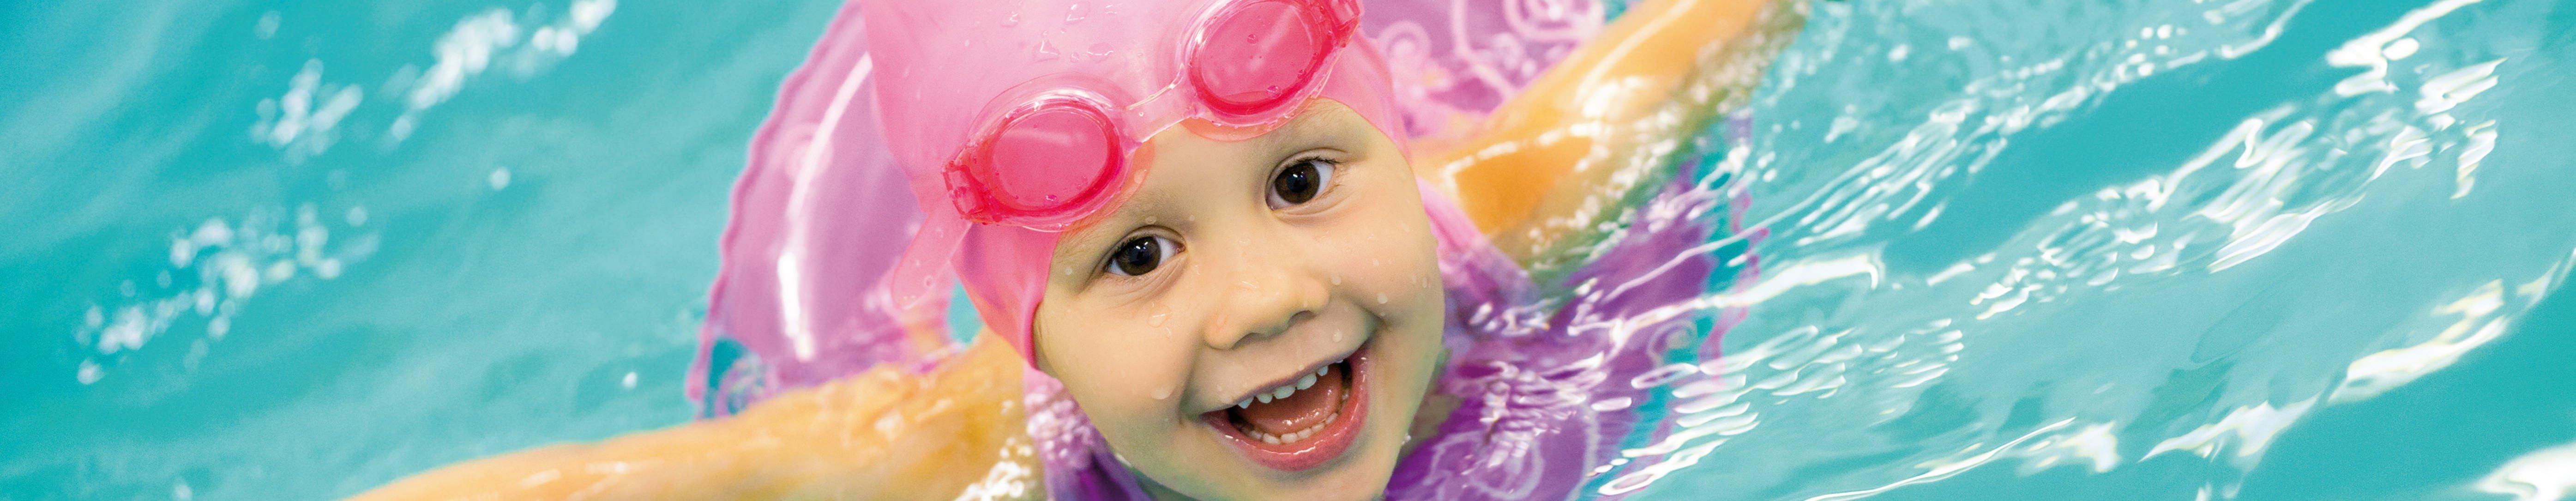 Kind-im-Schwimmbad